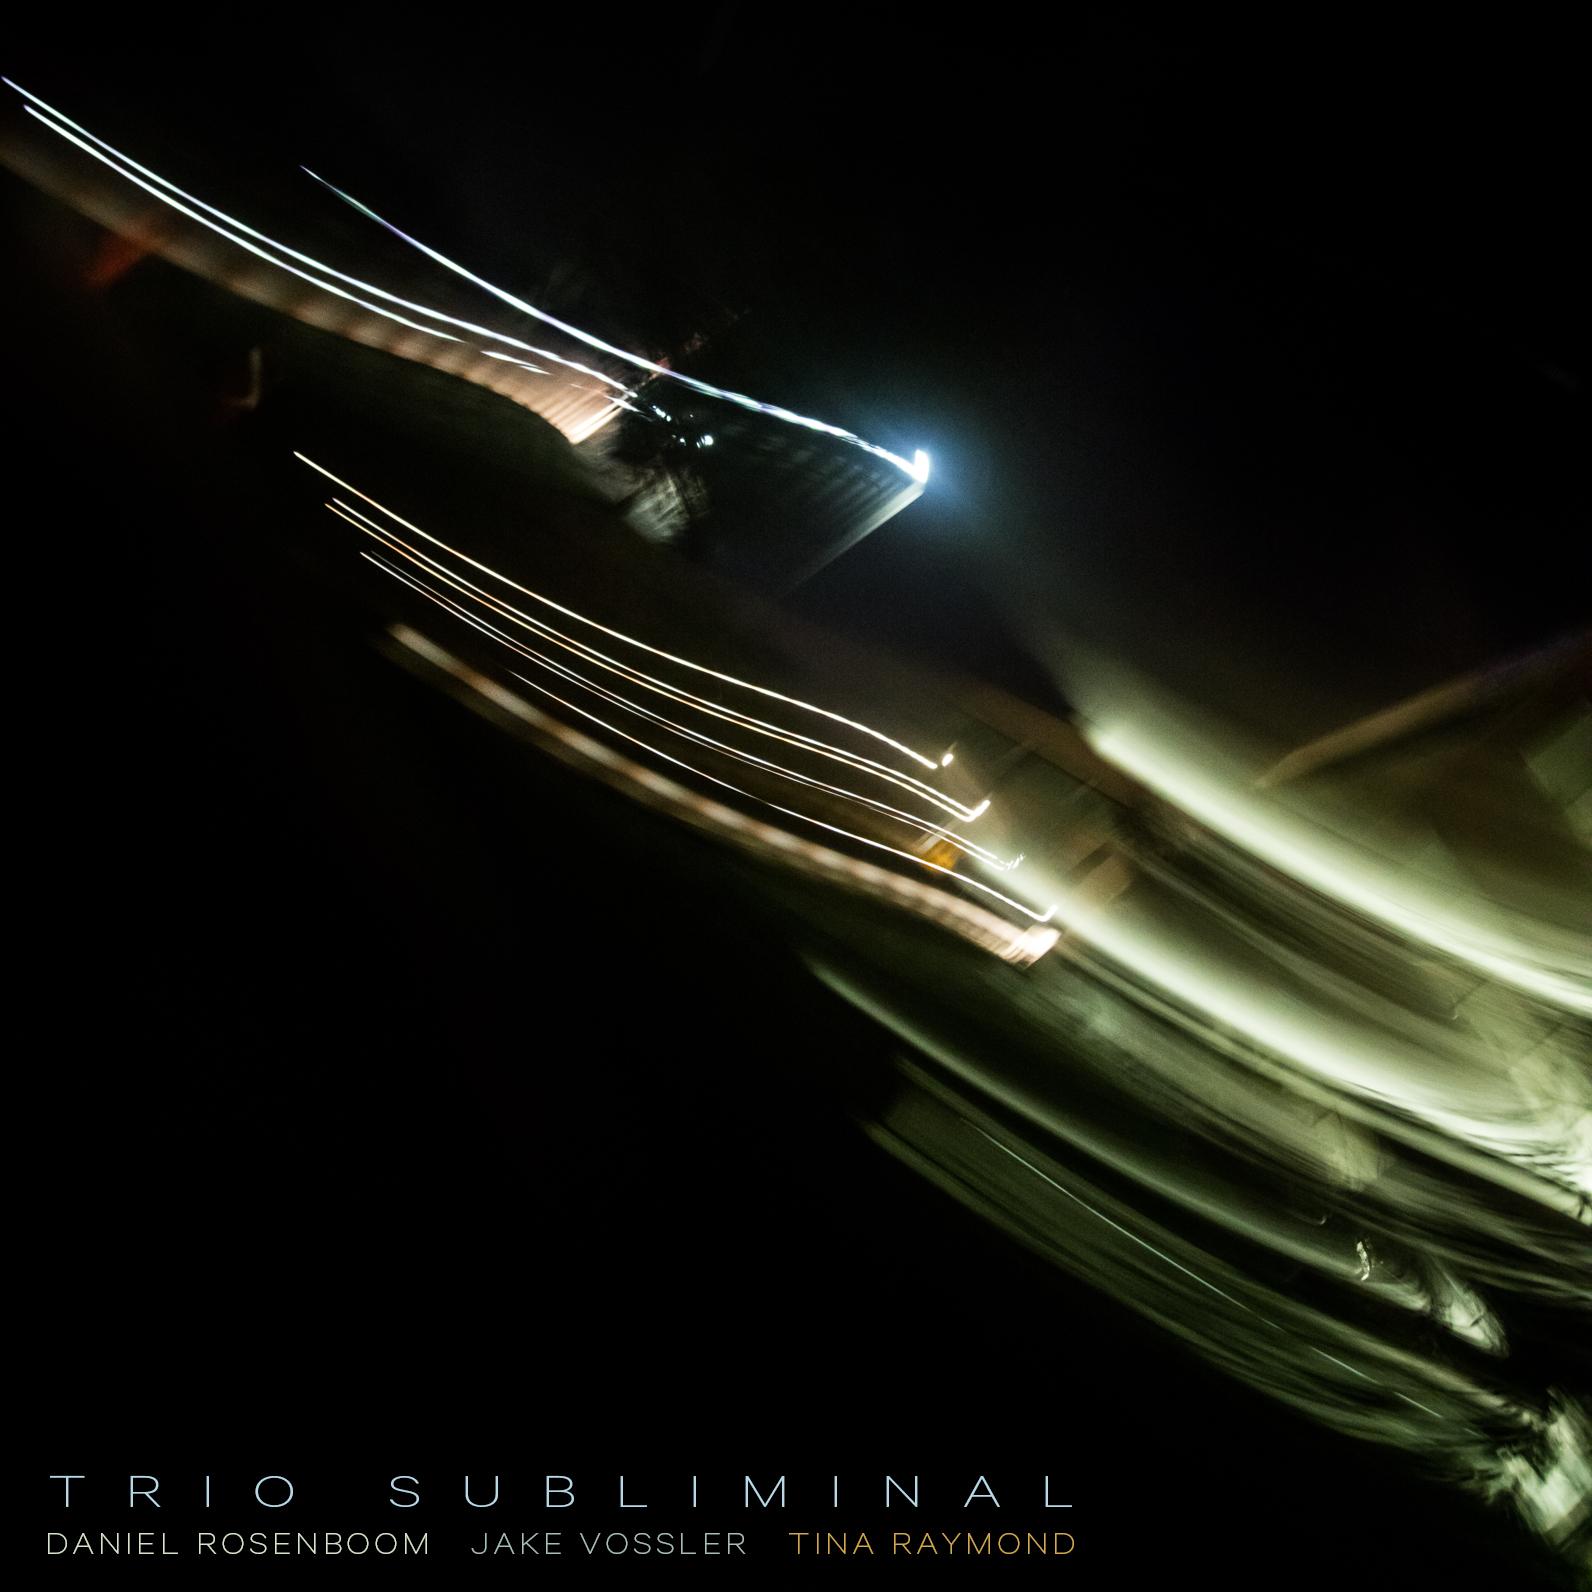 Daniel Rosenboom // Trio Subliminal